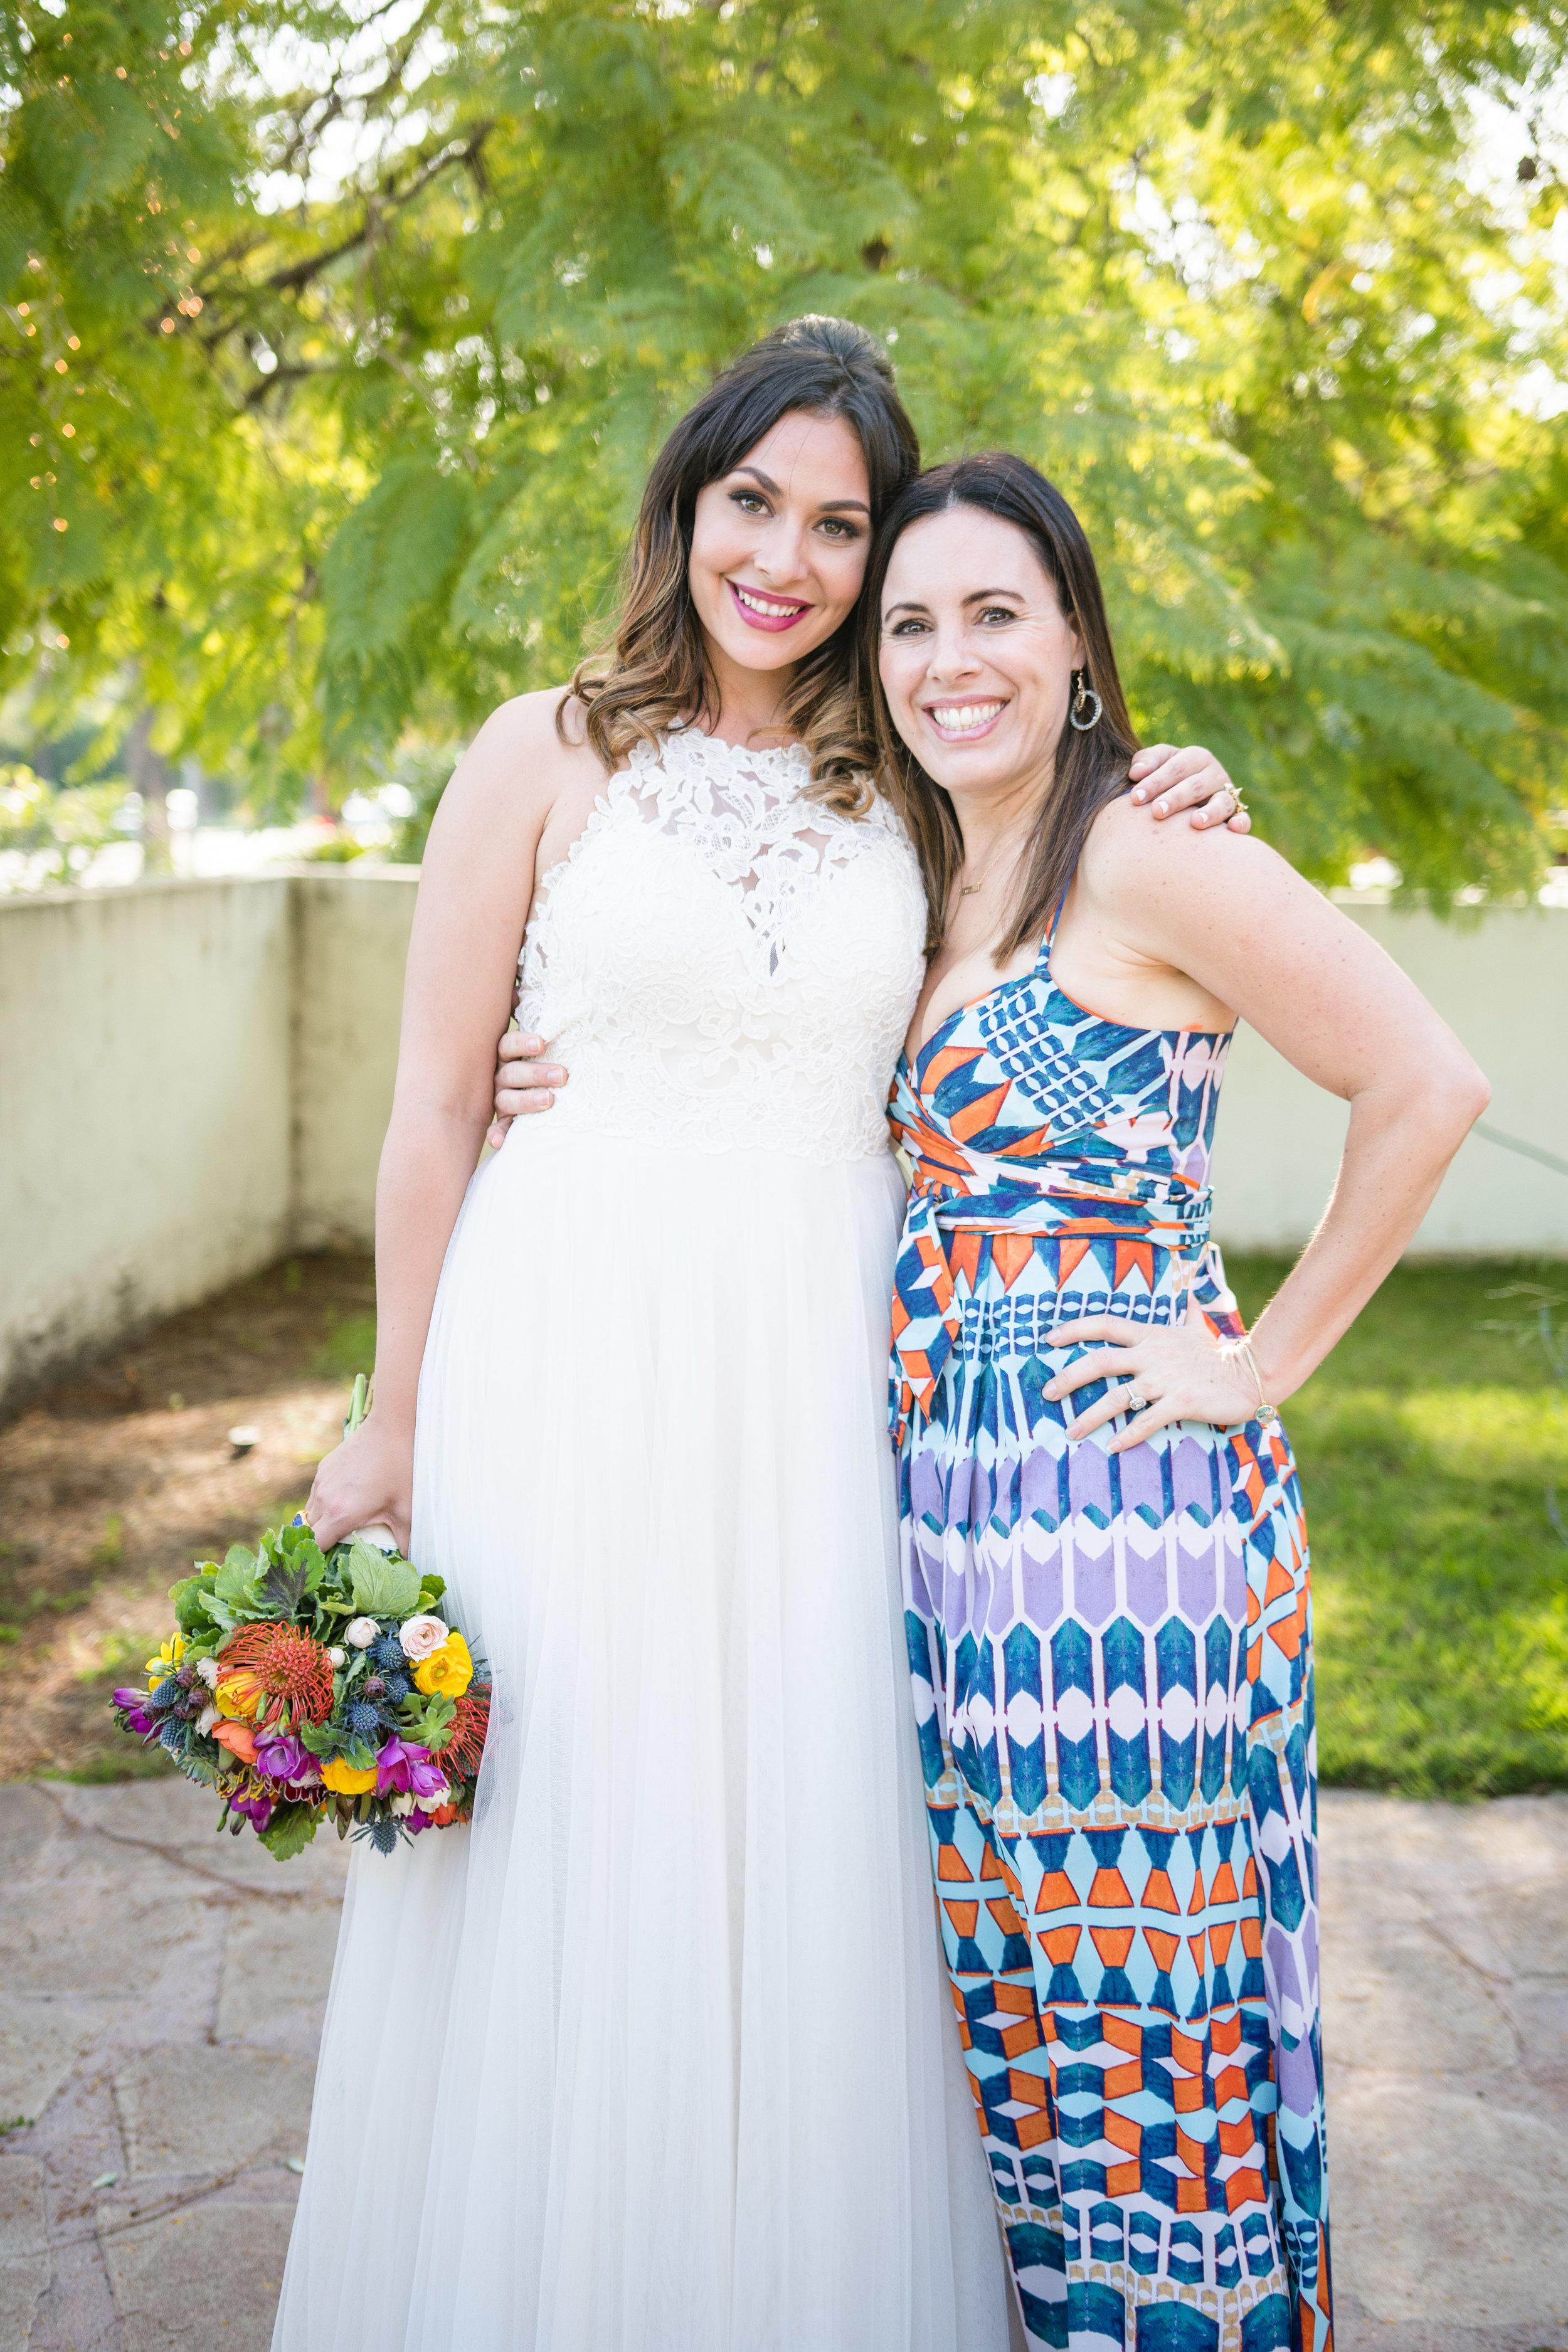 Vibrant Fiesta Backyard Wedding Reception bride posing with wedding guest.jpg